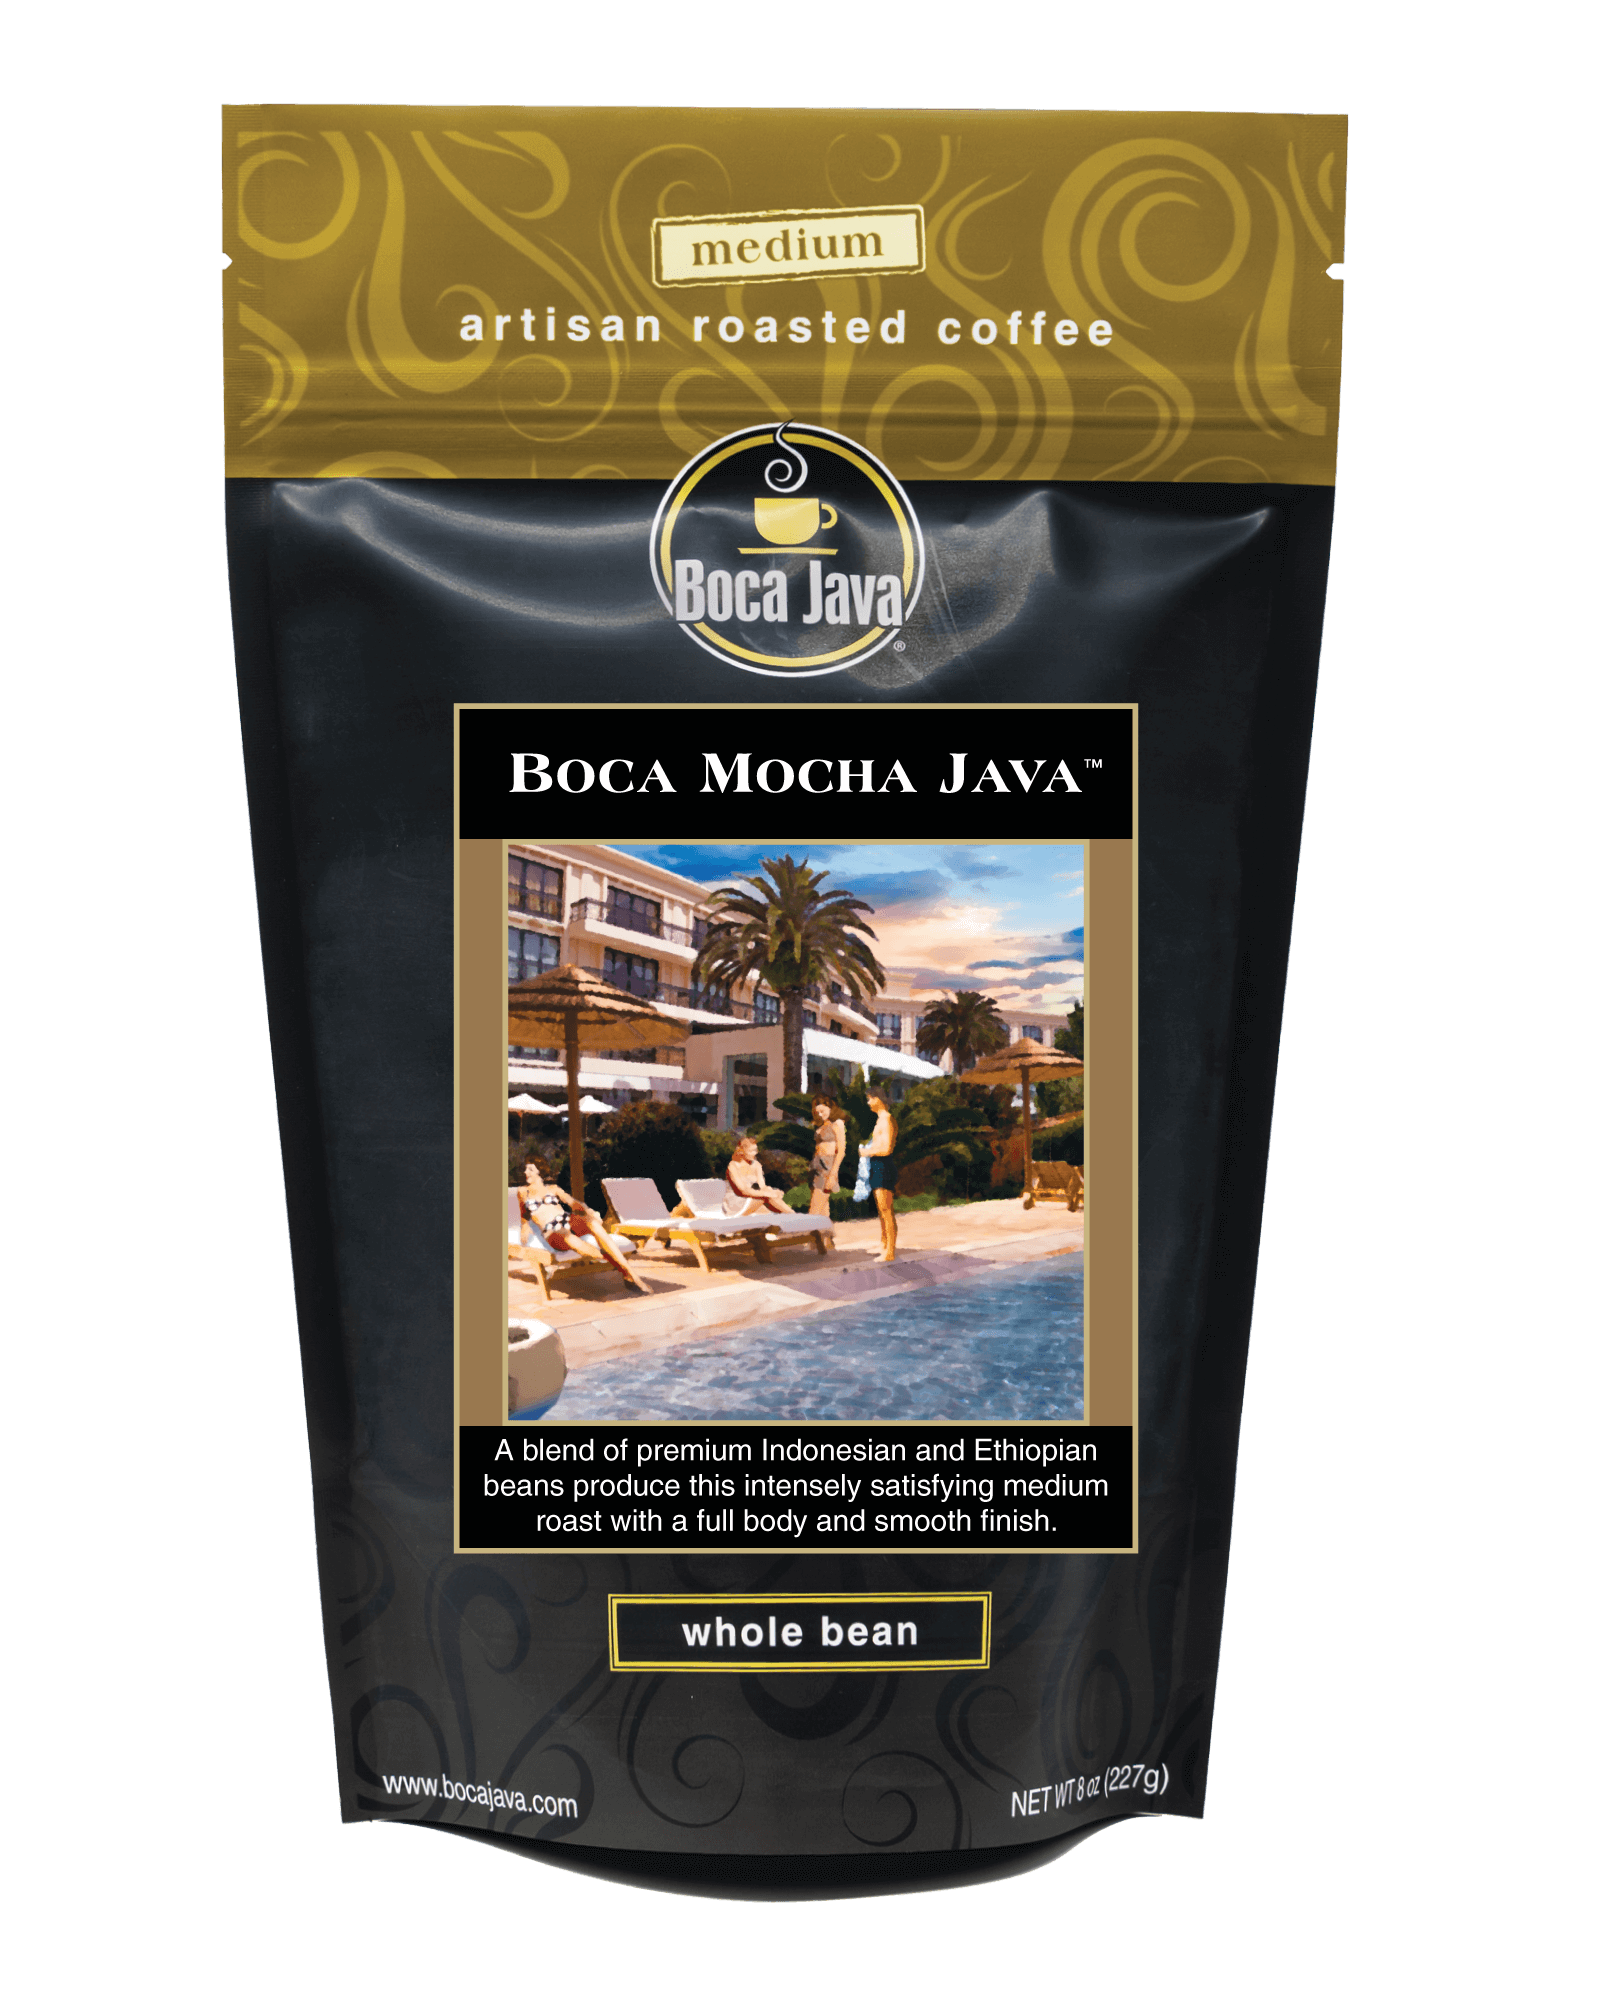 Boca Mocha Java